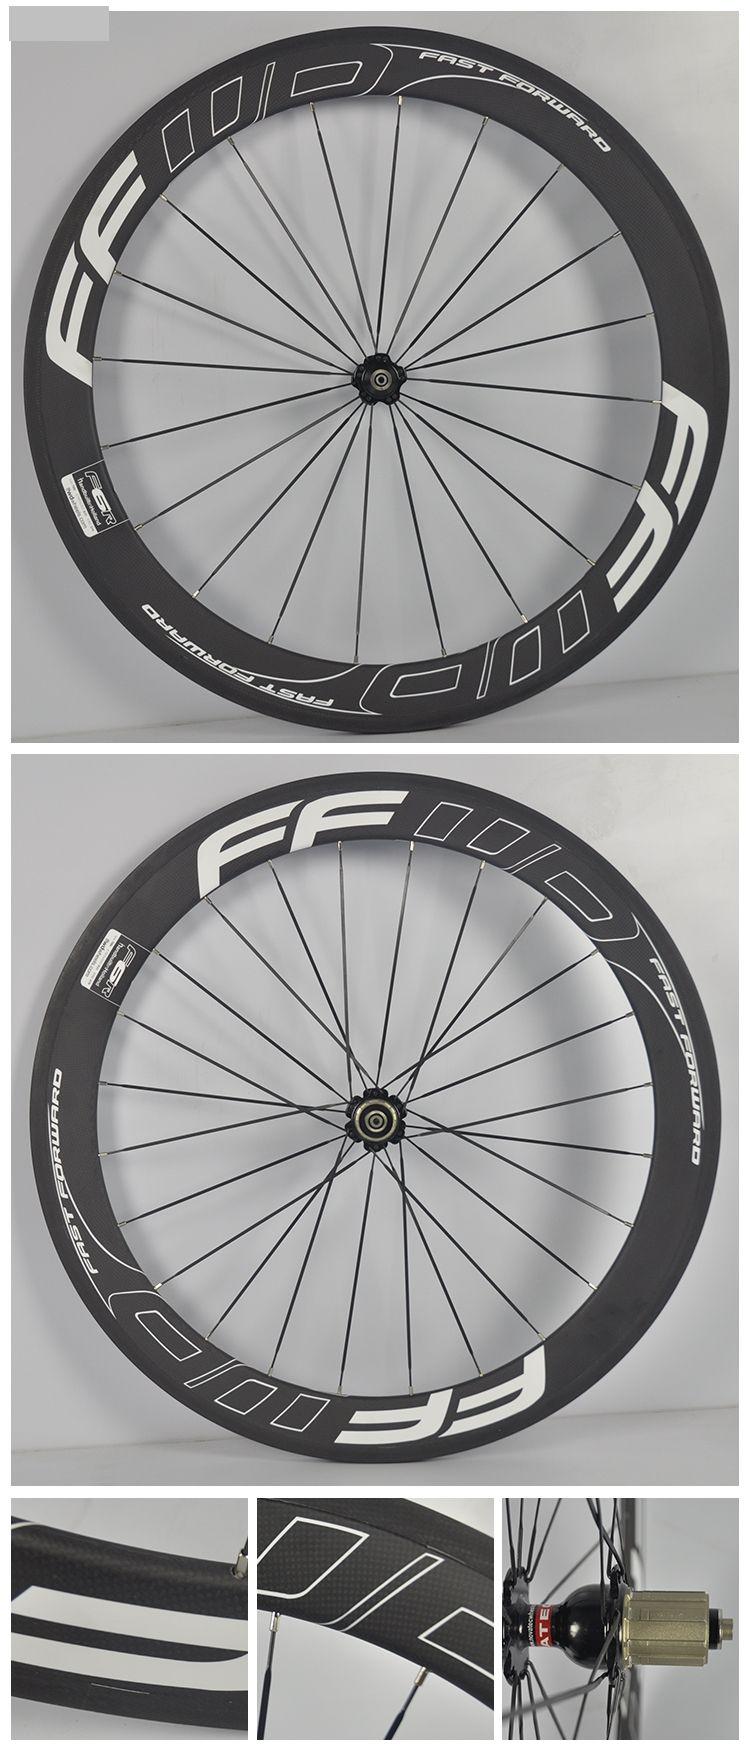 700C FFWD Carbon Road Wheelset 60mm Carbon Rims Bicycle Wheels Clincher Tubular Racing Cycling Kits Novatec 271 Hubs 20/24 Spokes